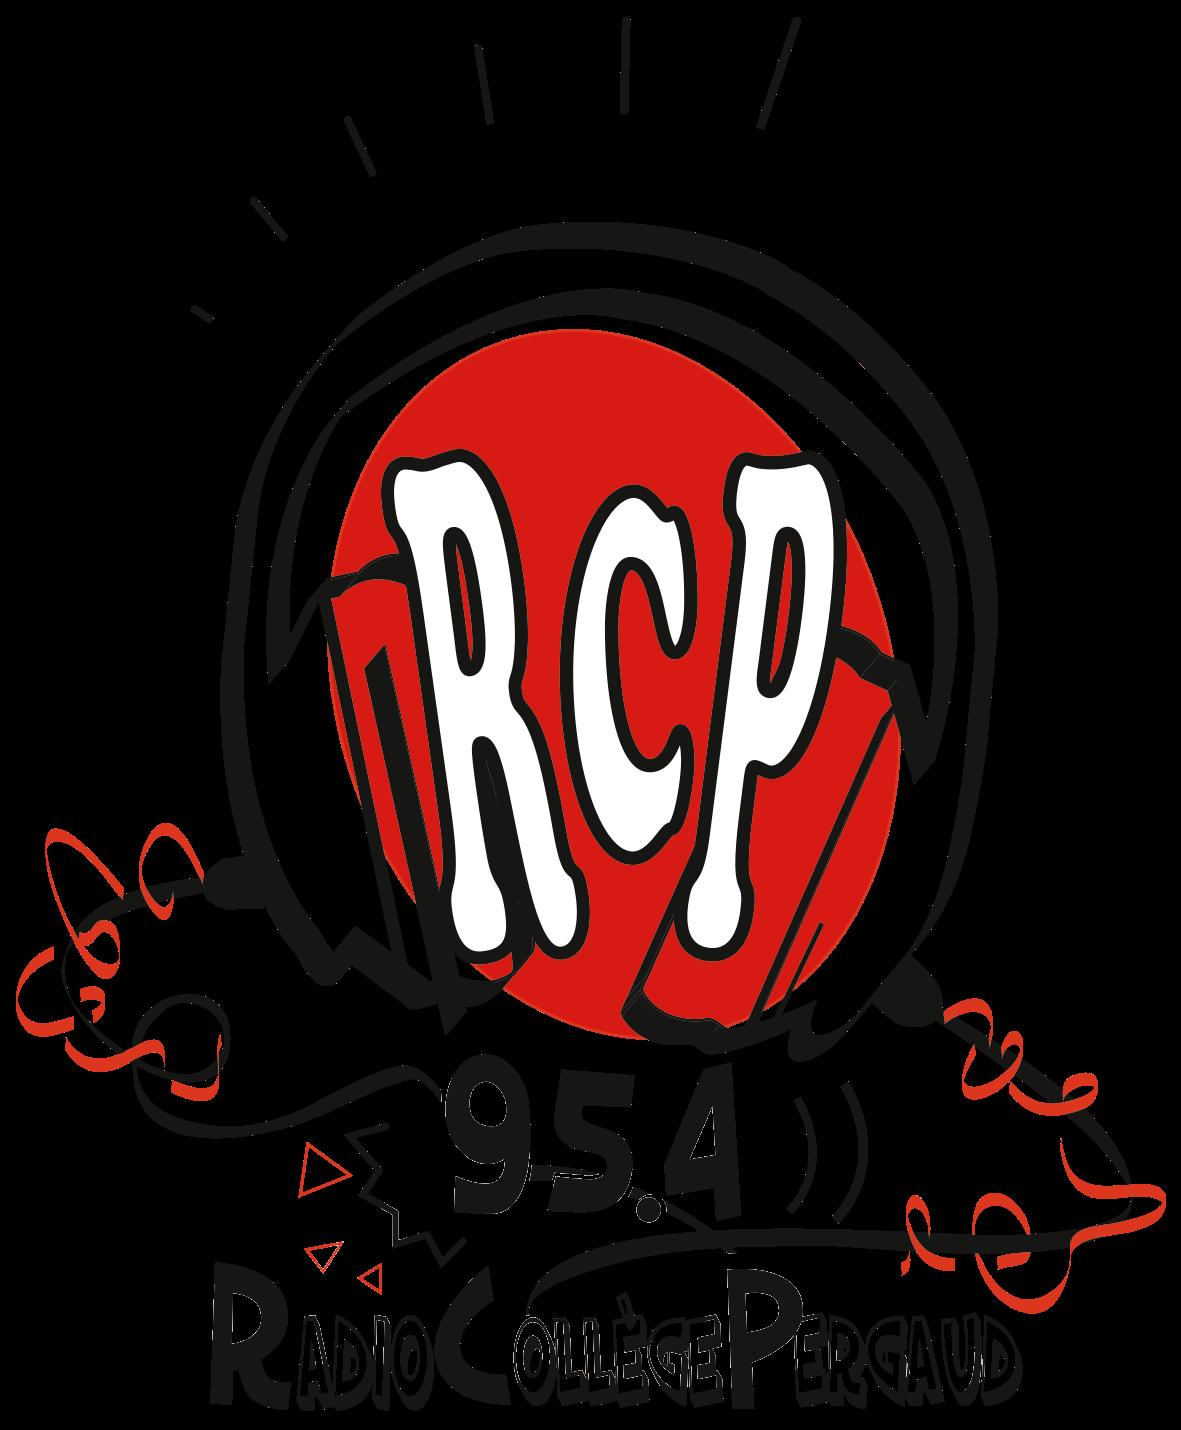 logo radio collège pergaud